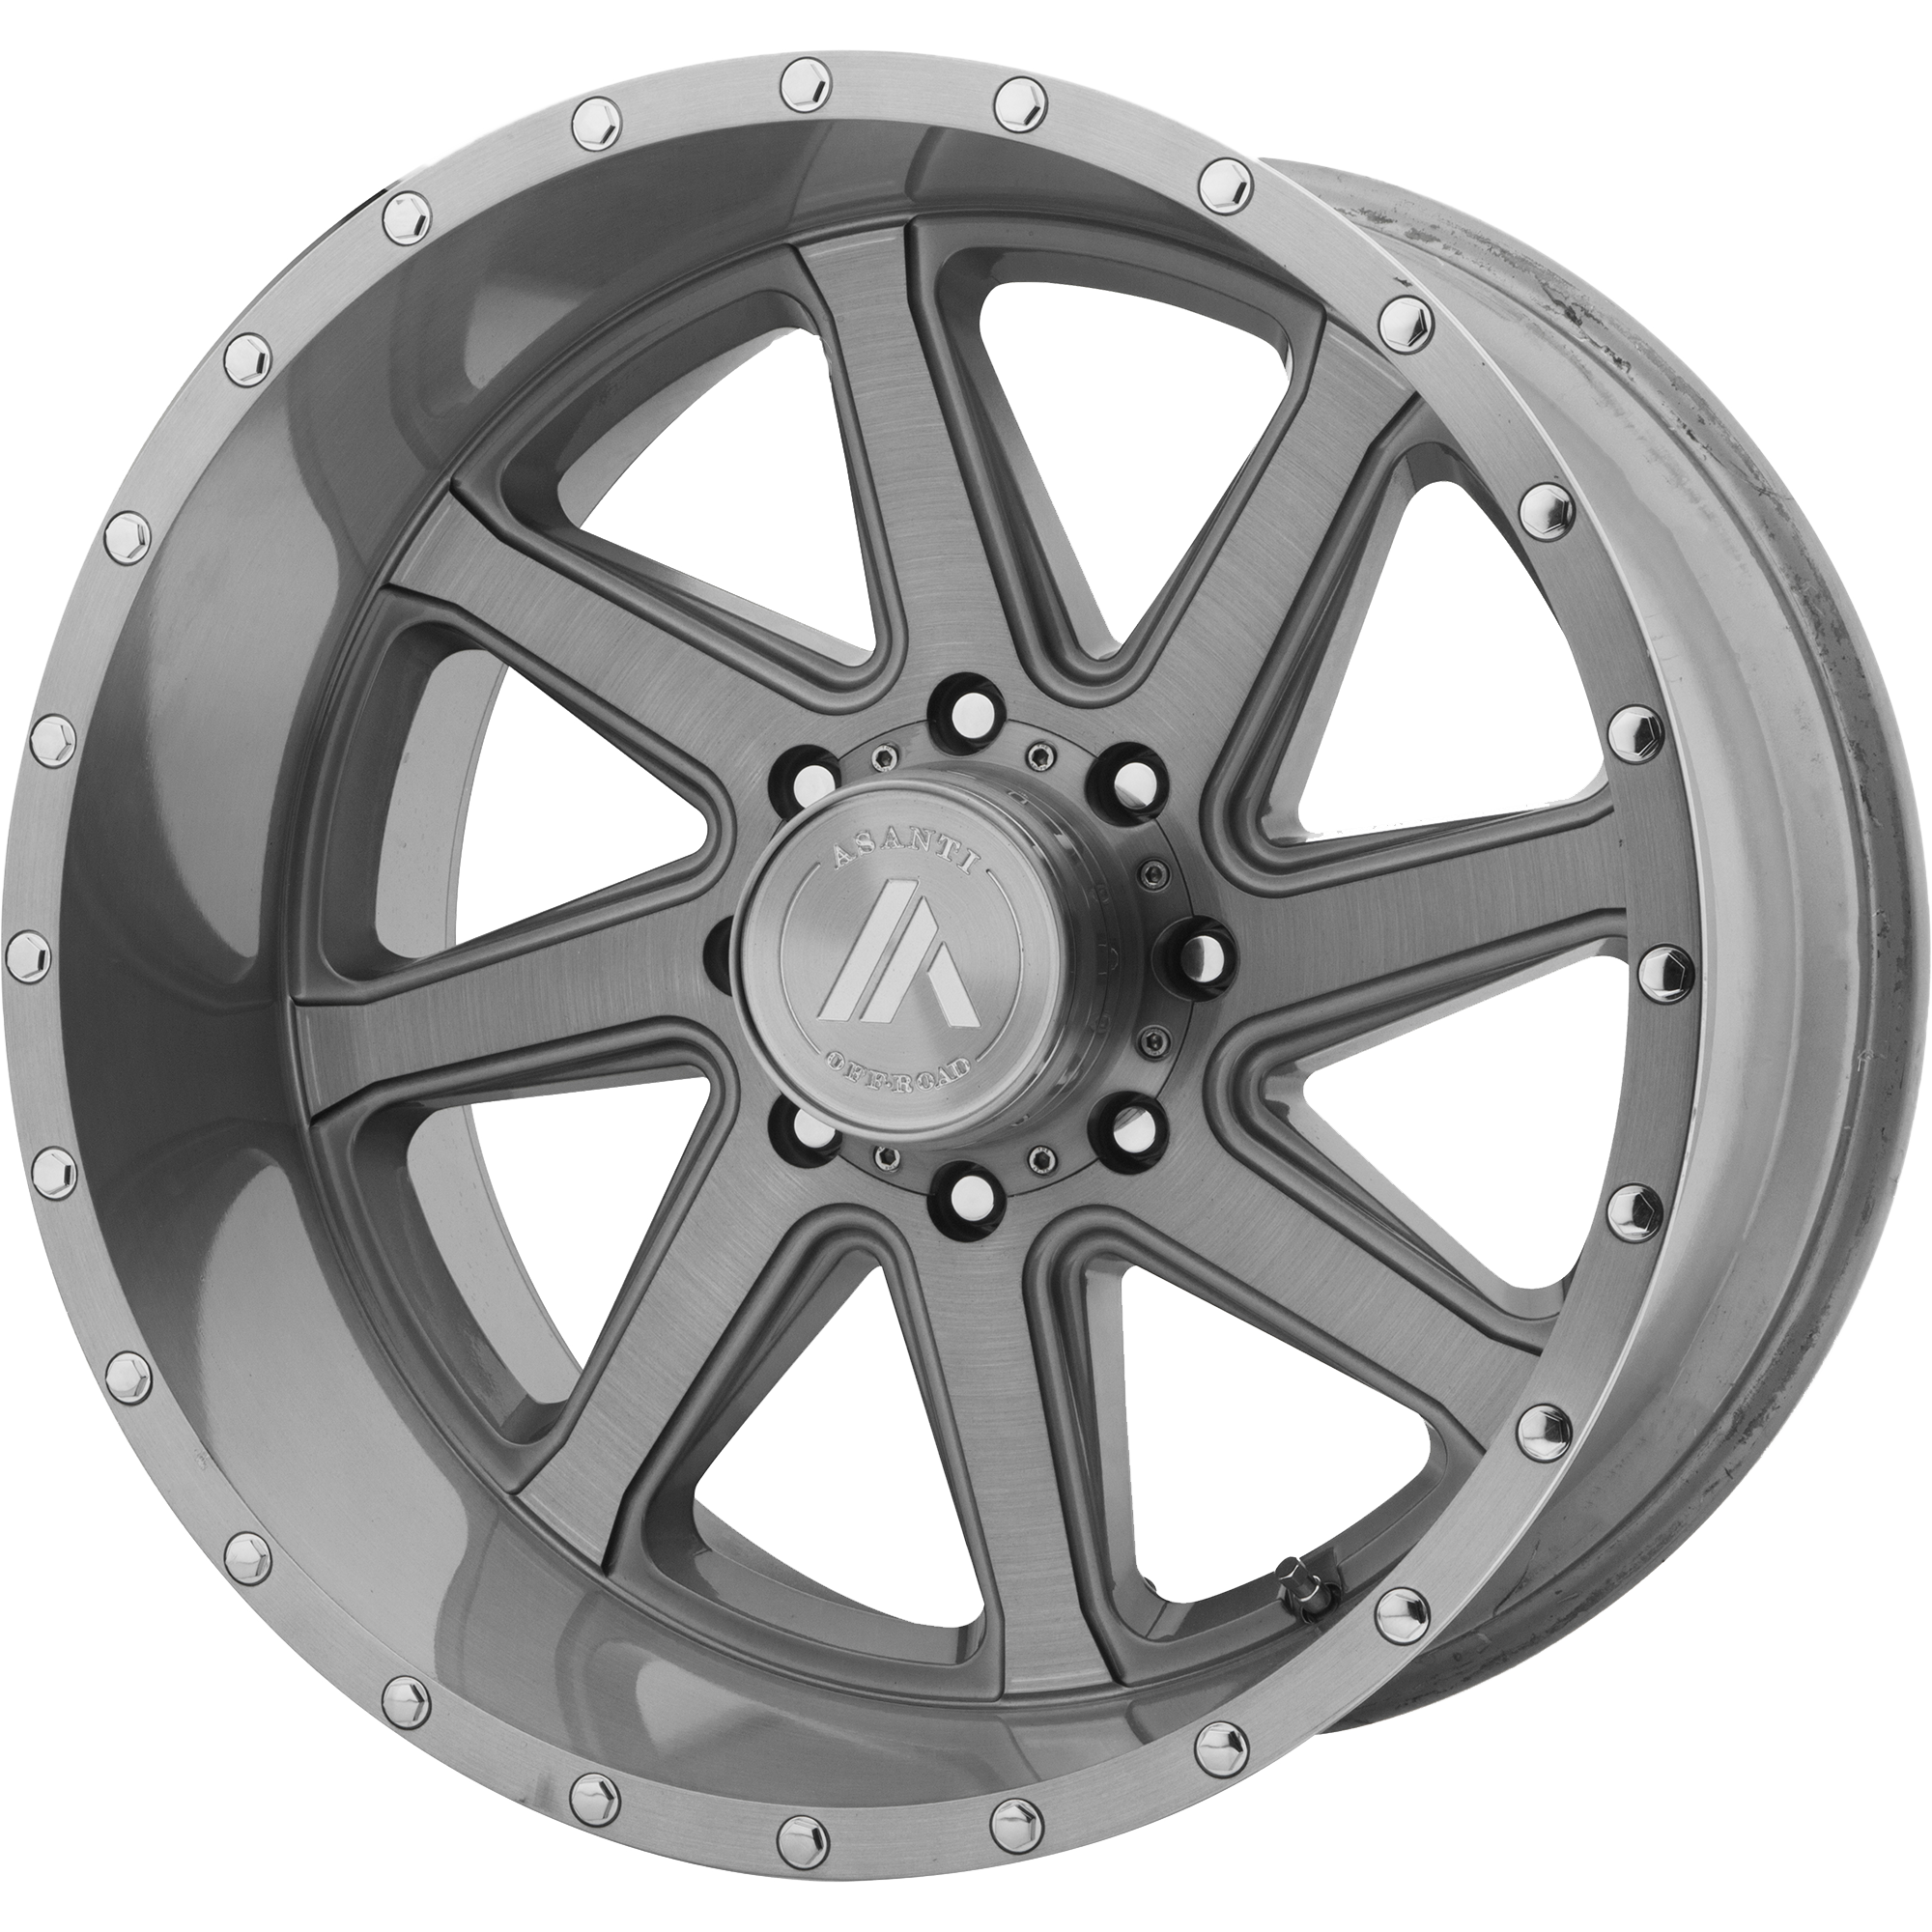 Asanti Off-Road Wheels AB814 Titanium-Brushed